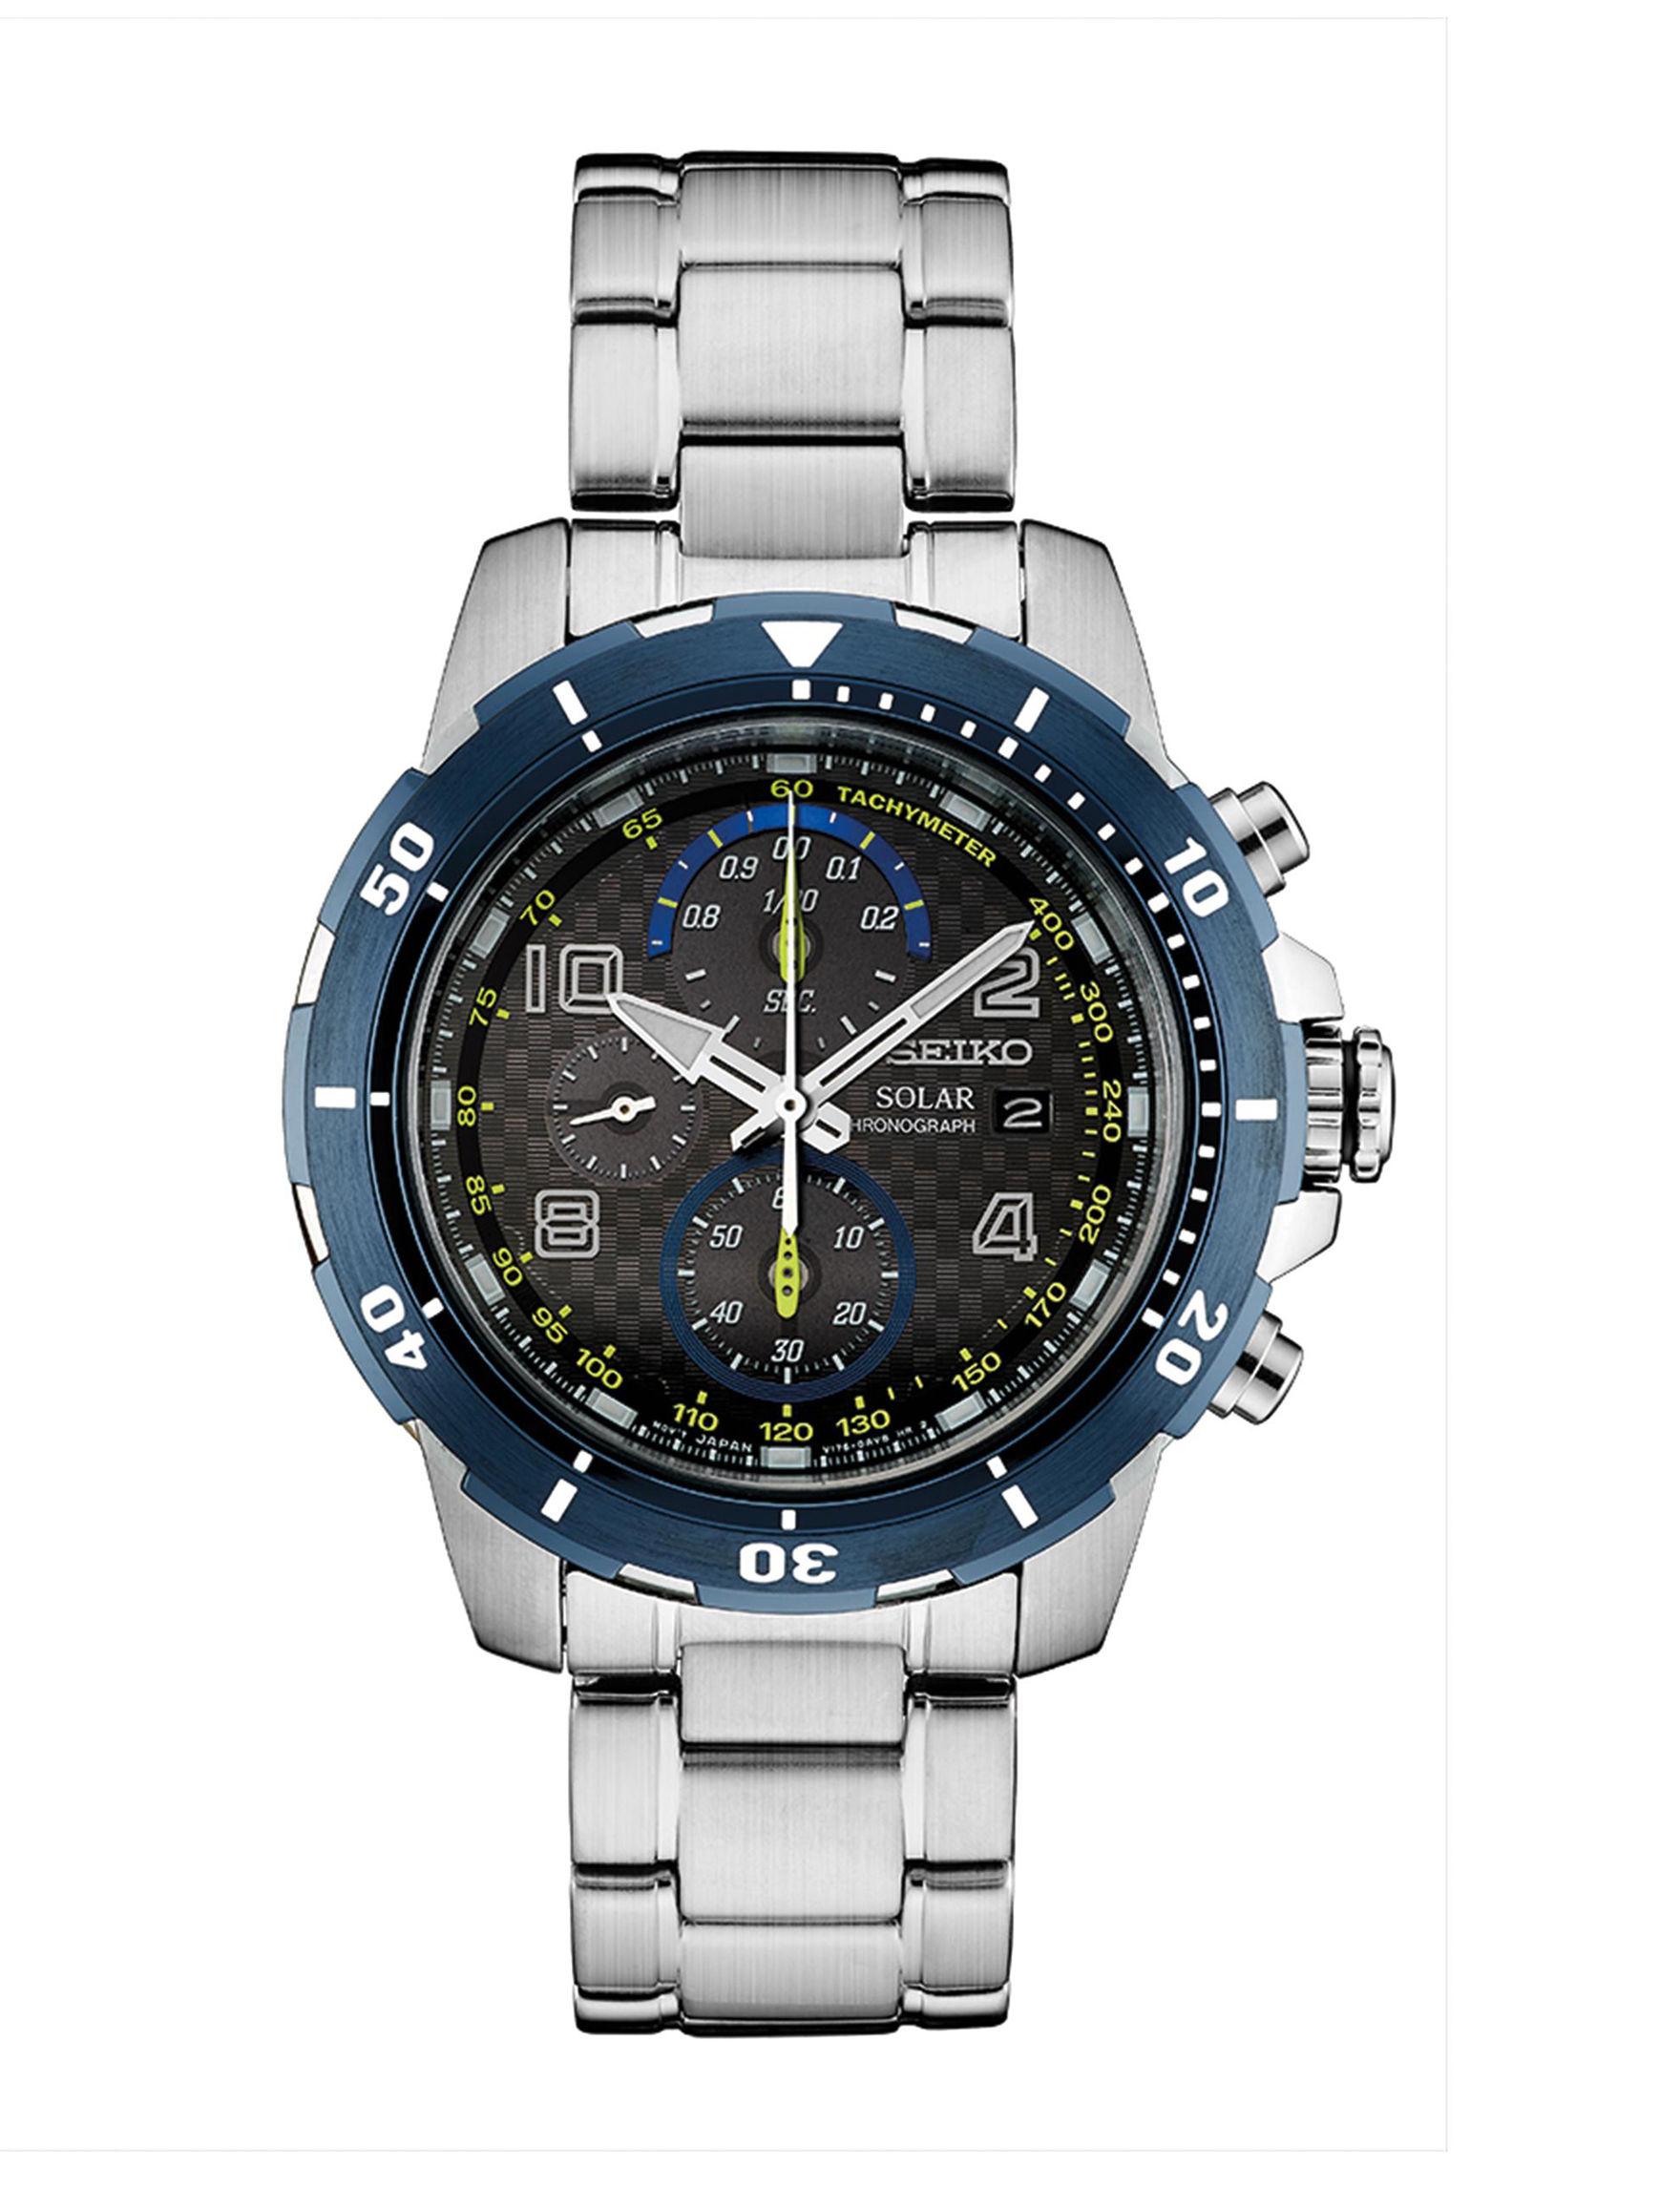 Seiko Silver Sport Watches Accessories